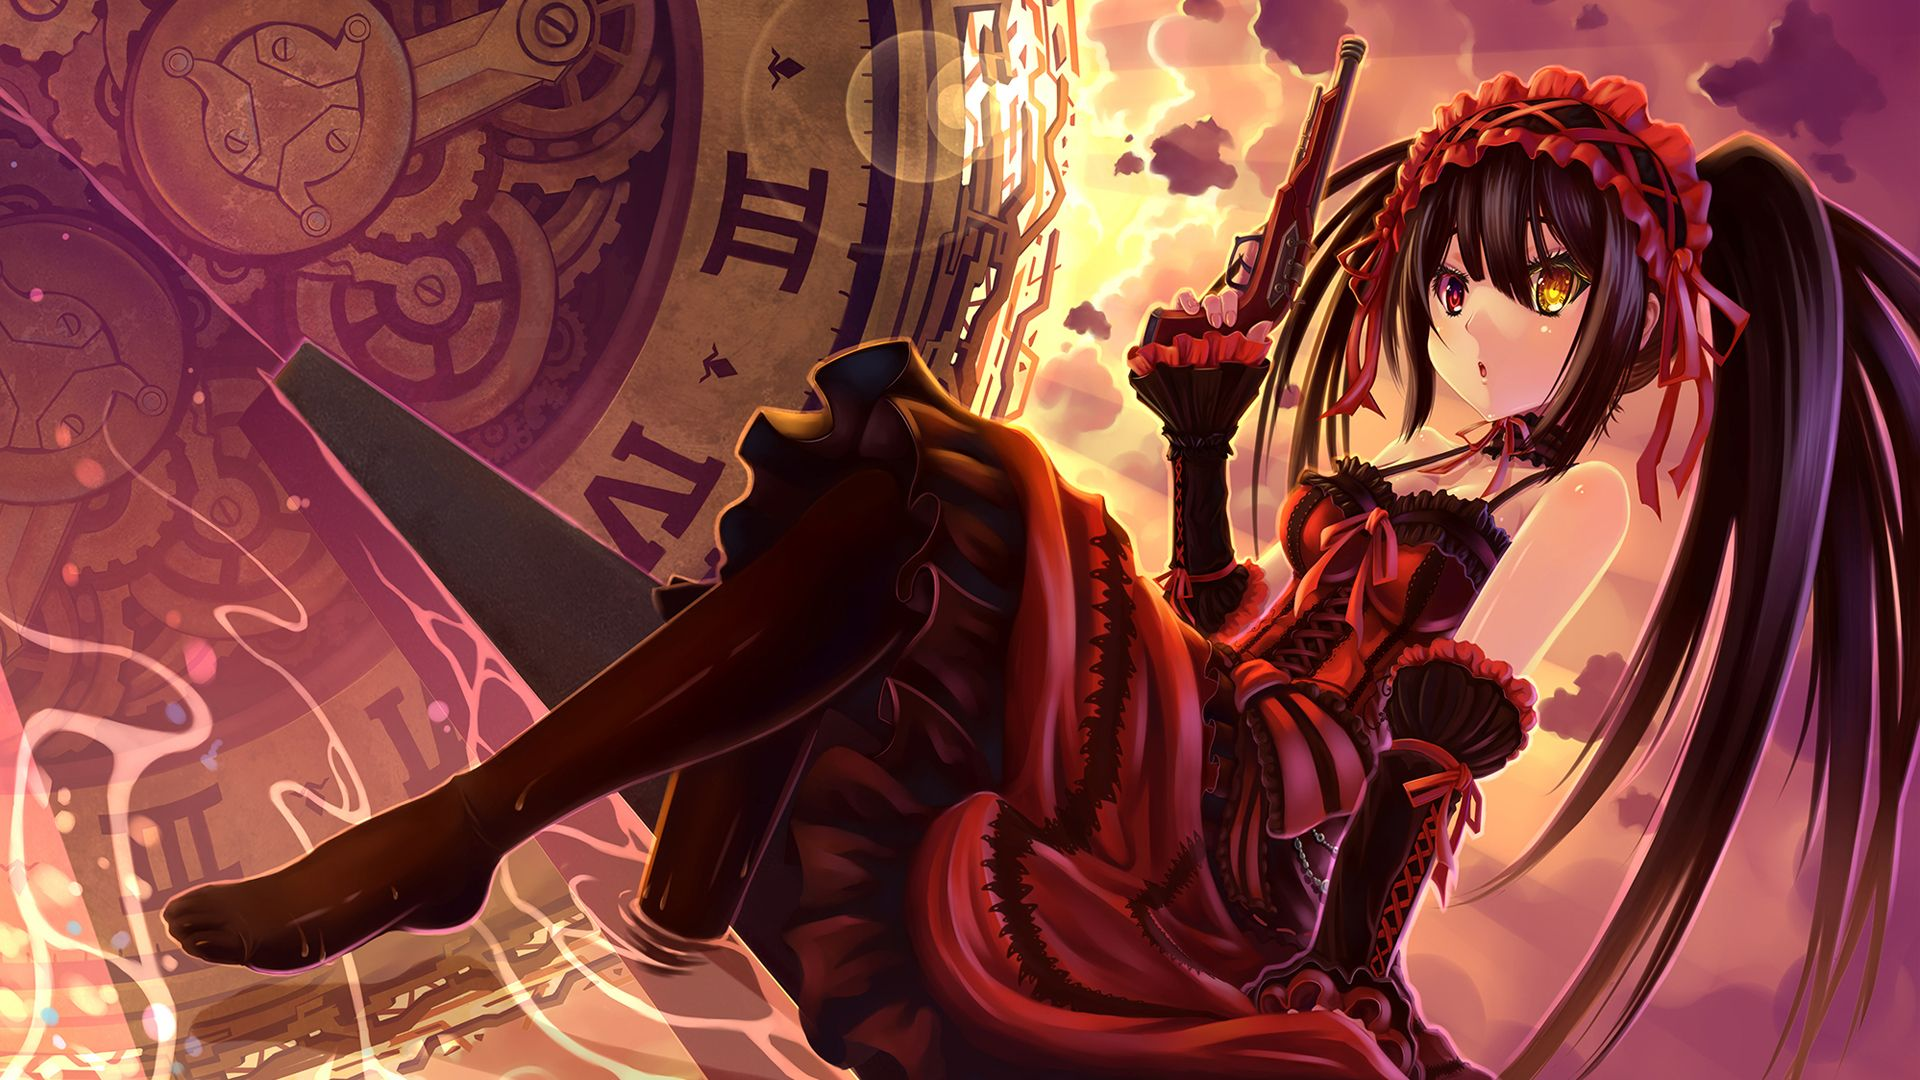 Kurumi Hd Wallpaper Pemandangan Anime Gambar Anime Gadis Animasi